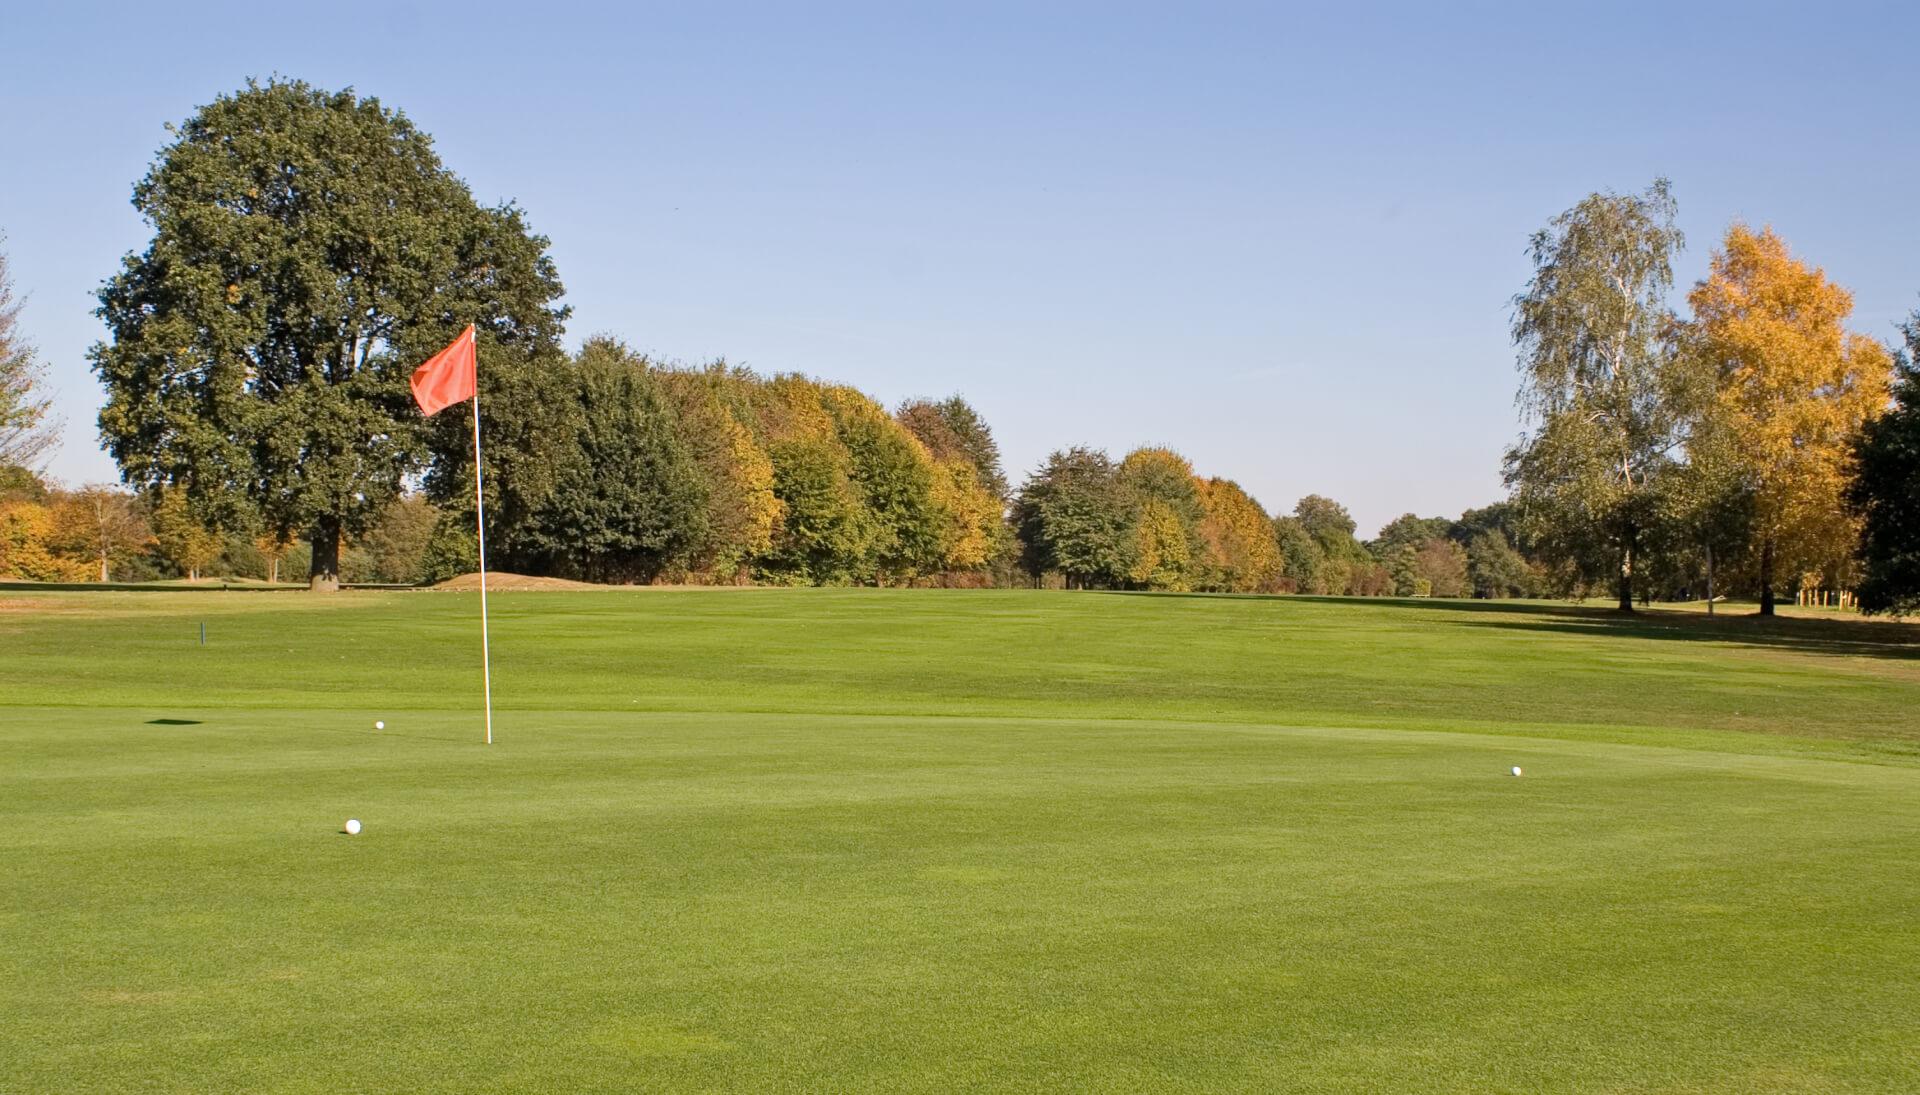 https://golfclub-peckeloh.de/wp-content/uploads/2018/02/PICT0282.jpg